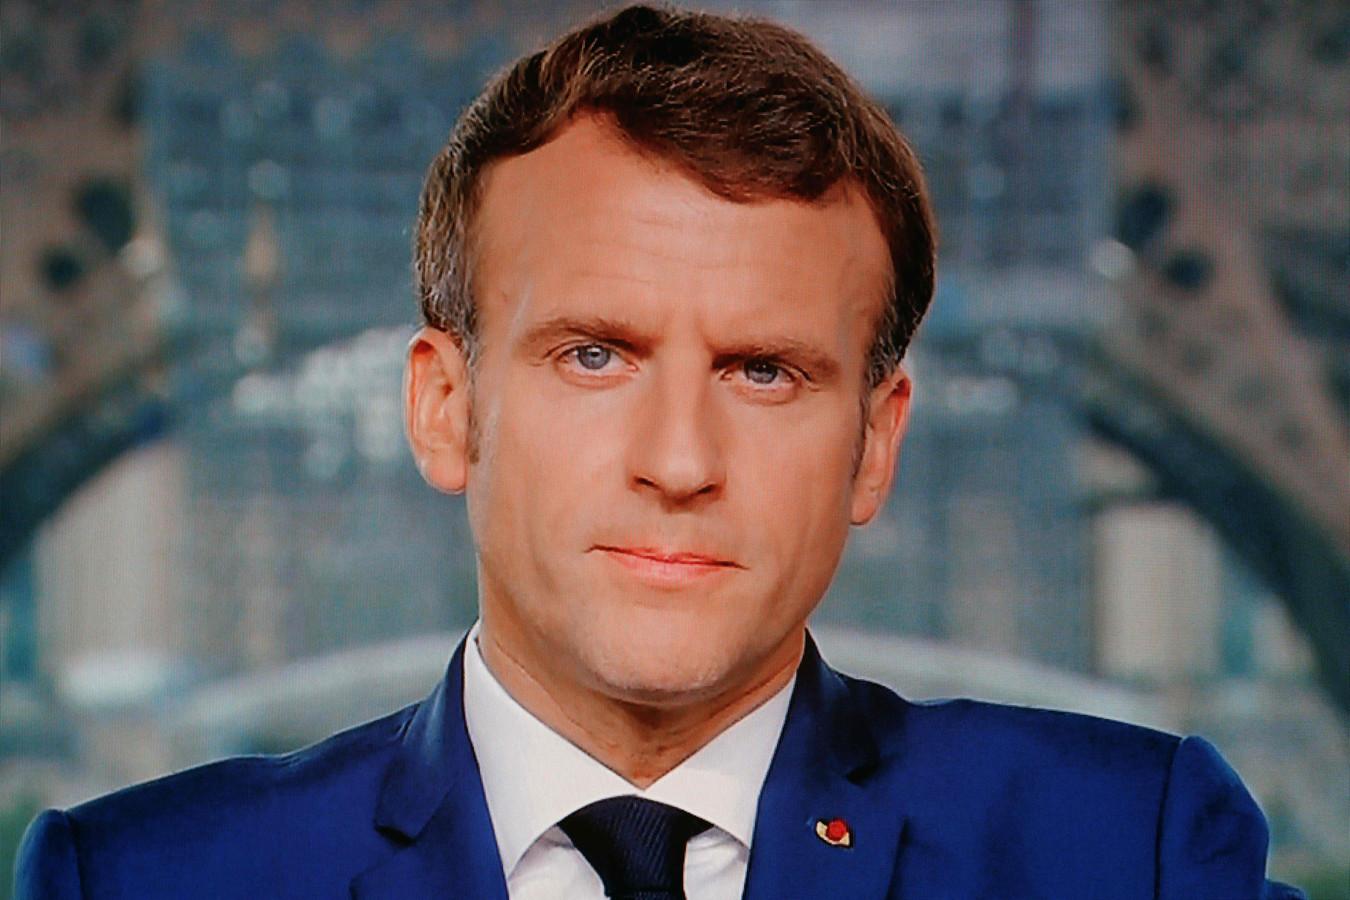 De Franse president Emmanuel Macron